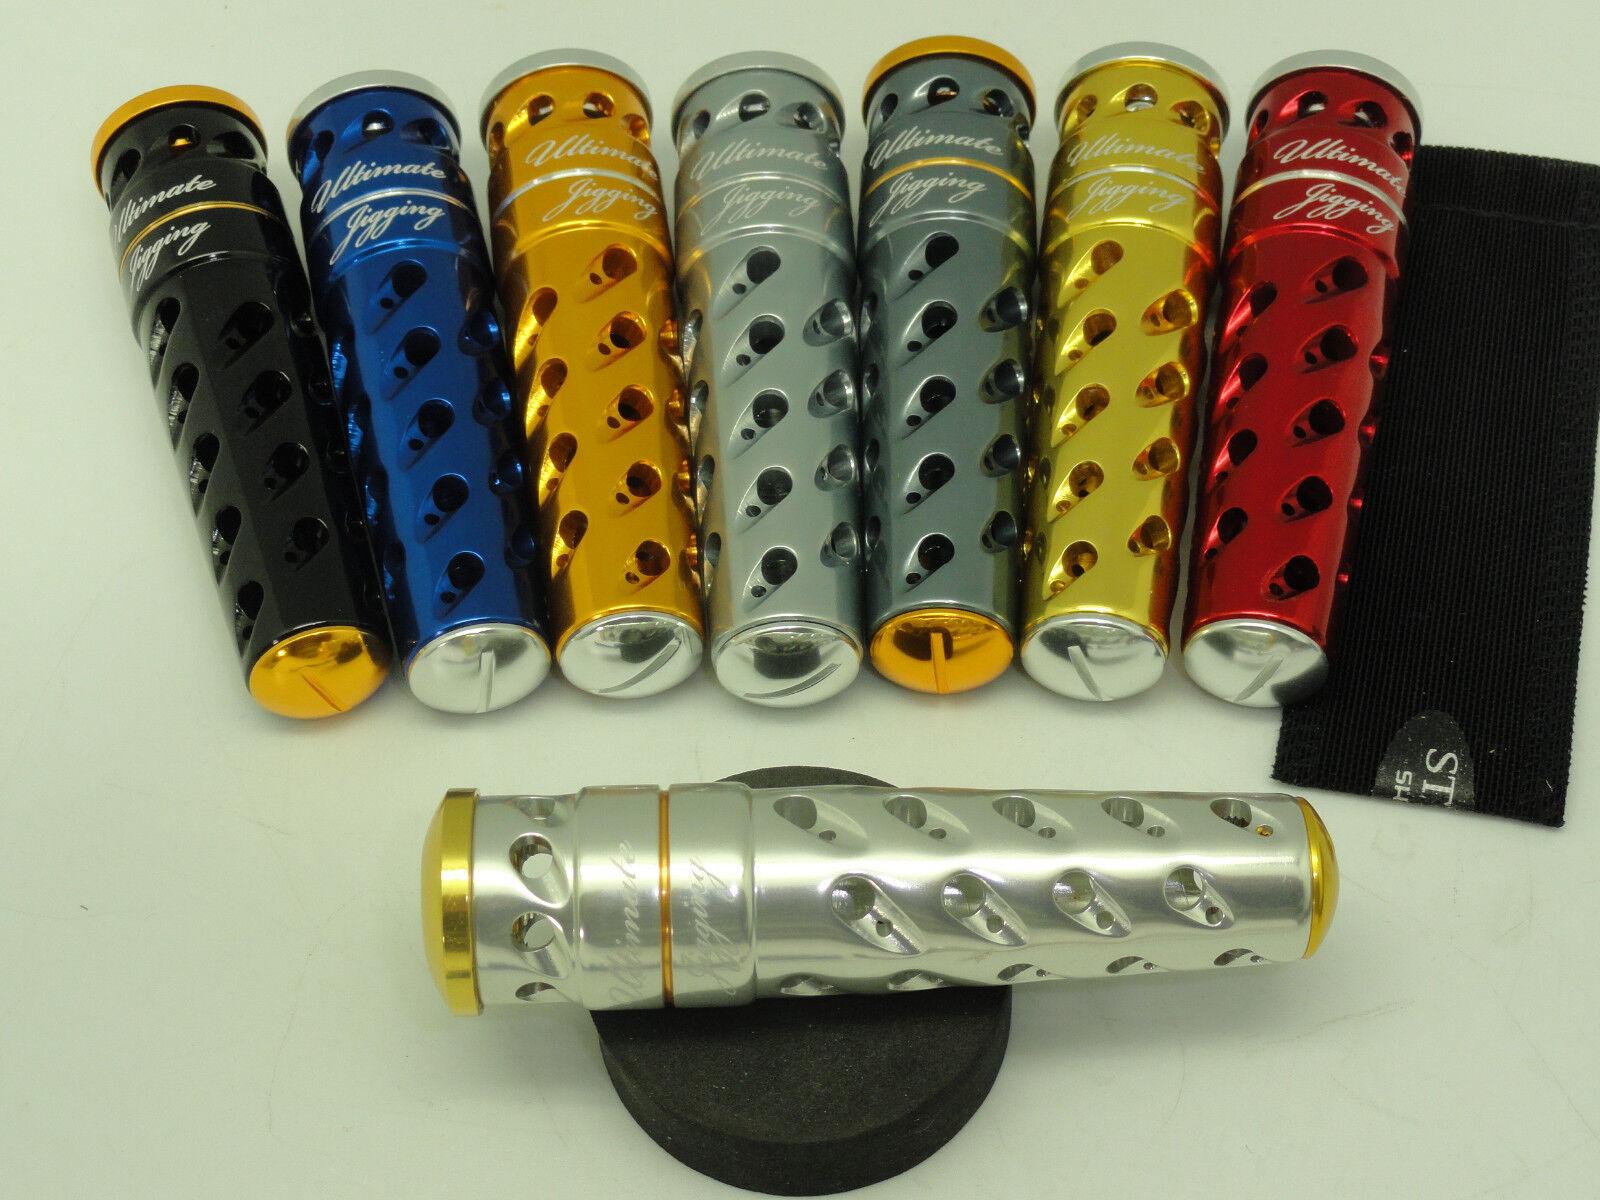 UJ T-BAR T092 handle knob for Shimano Talica 10 12 16 20 25 12 Speed reel SV GD